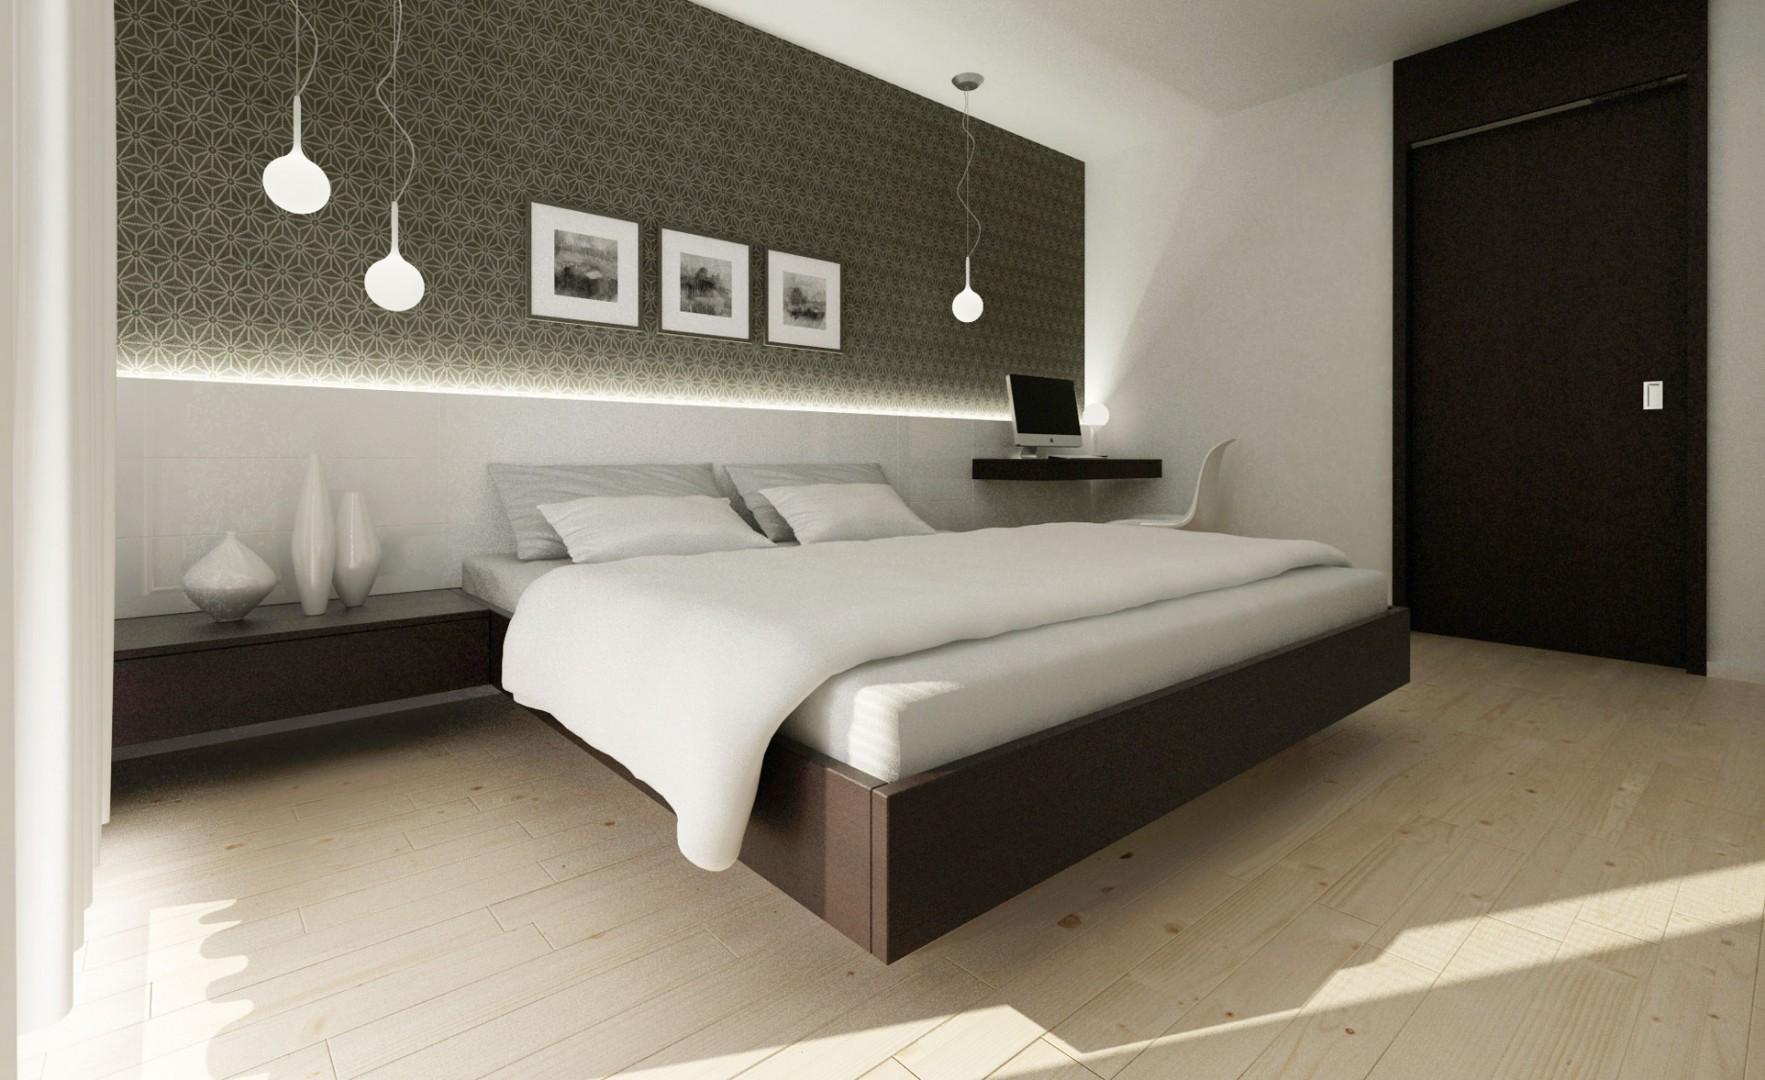 návrh interiéru bytu - spálňa